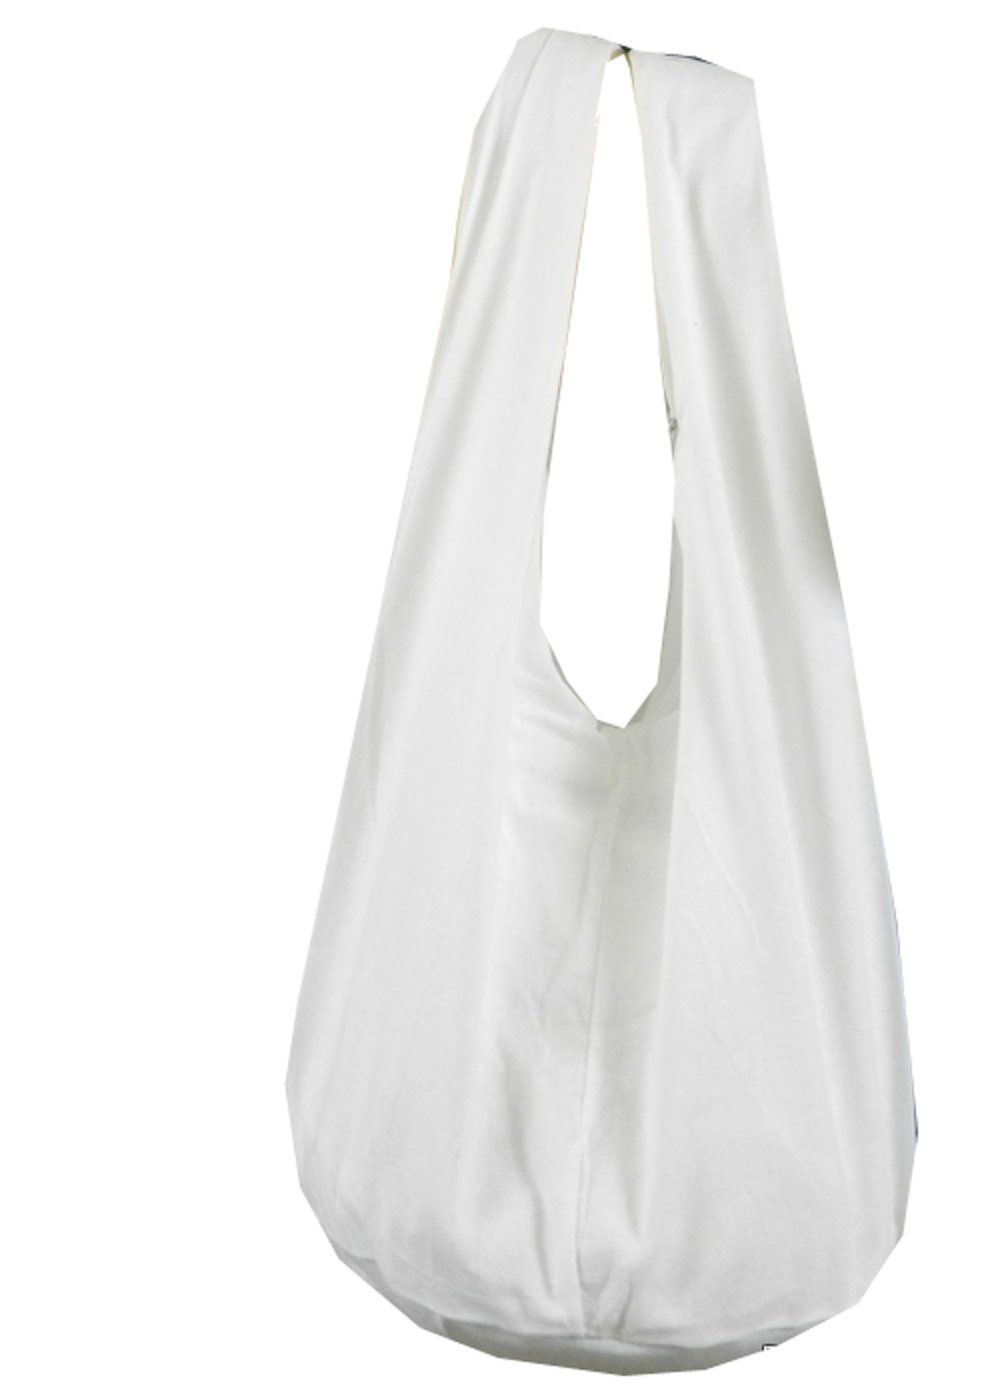 BTP! Thai Monk Buddha Cotton Sling Crossbody Messenger Bag Purse Hippie Hobo Solid Large (White XL3)